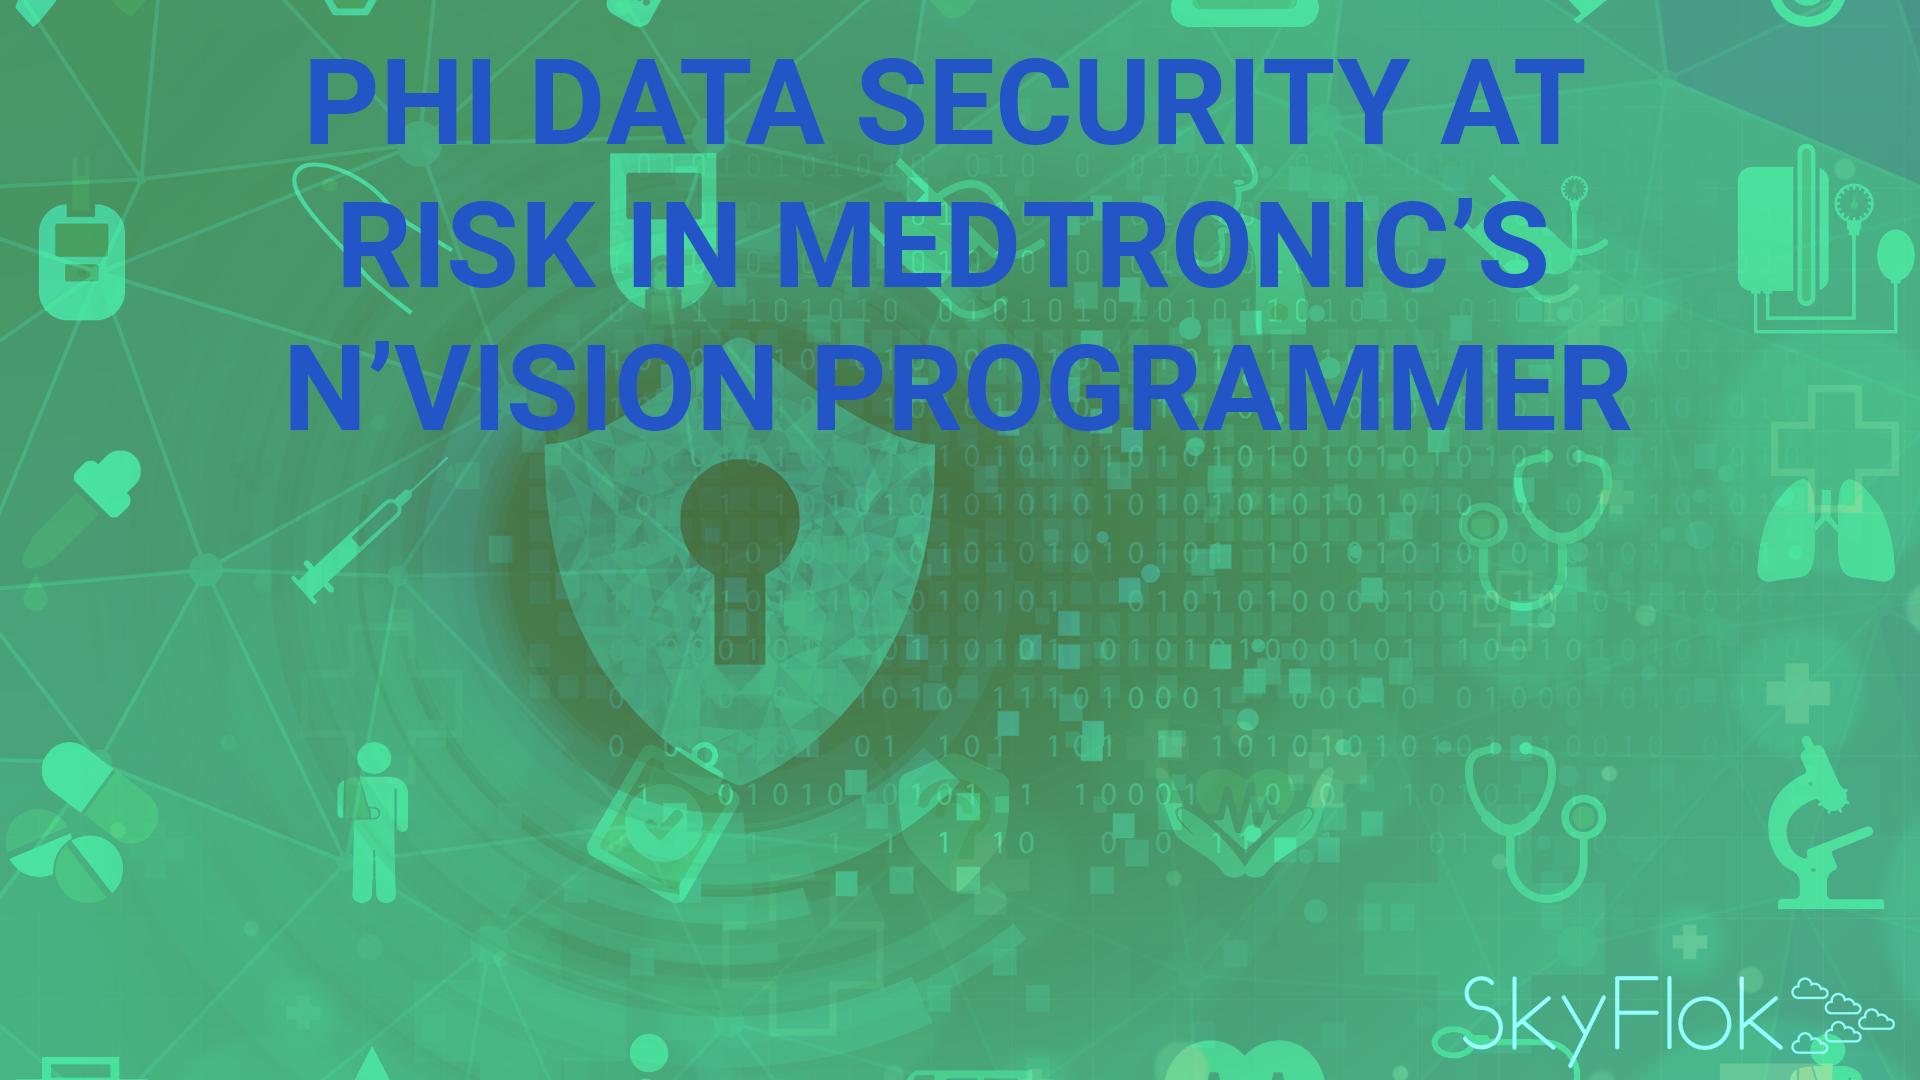 PHI Data Security at Risk in Medtronic's N'Vision Programmer